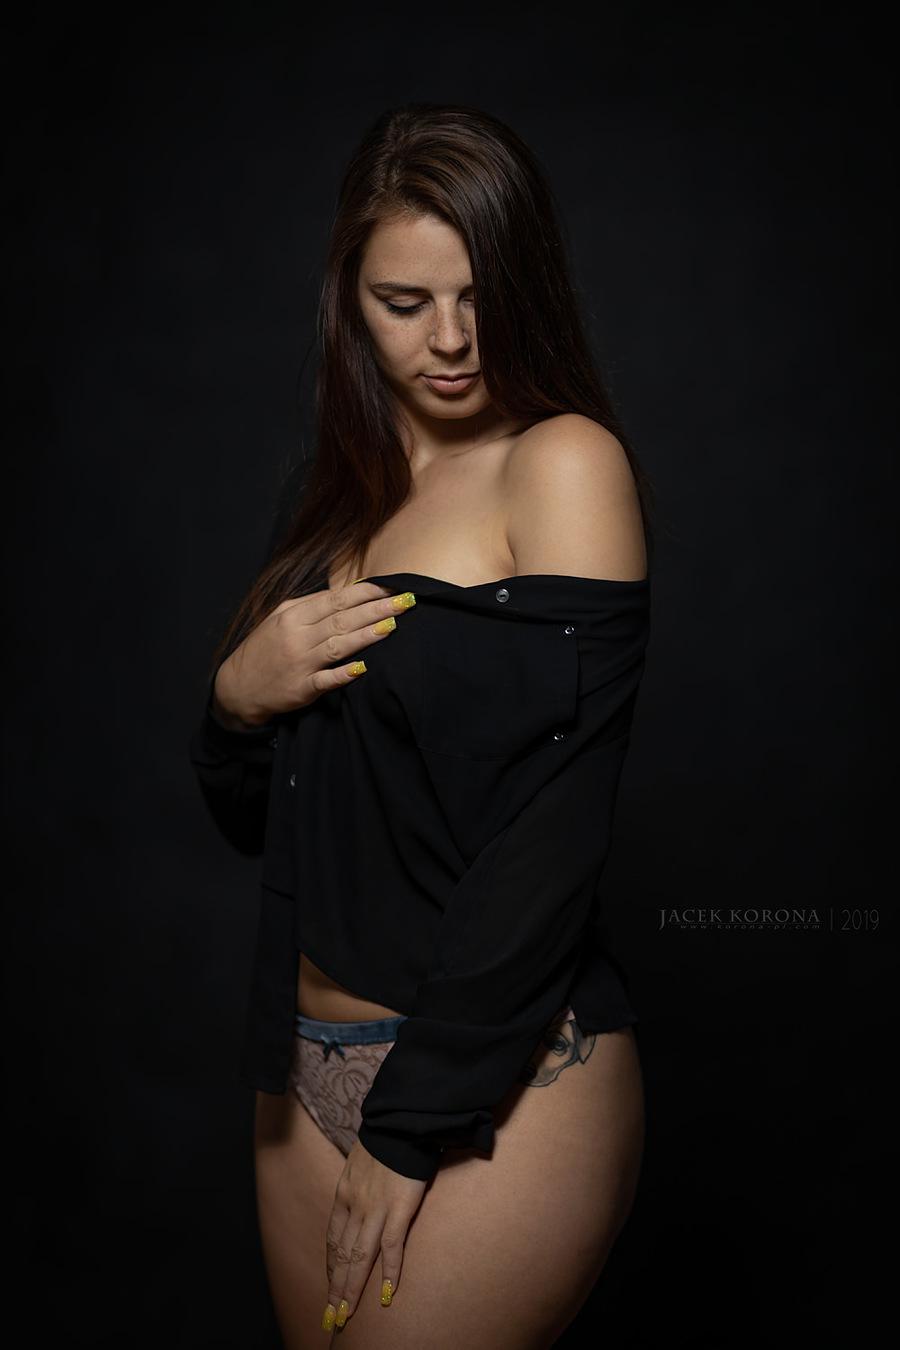 Daria / Photography by Jacek Korona / Uploaded 20th October 2019 @ 01:58 PM